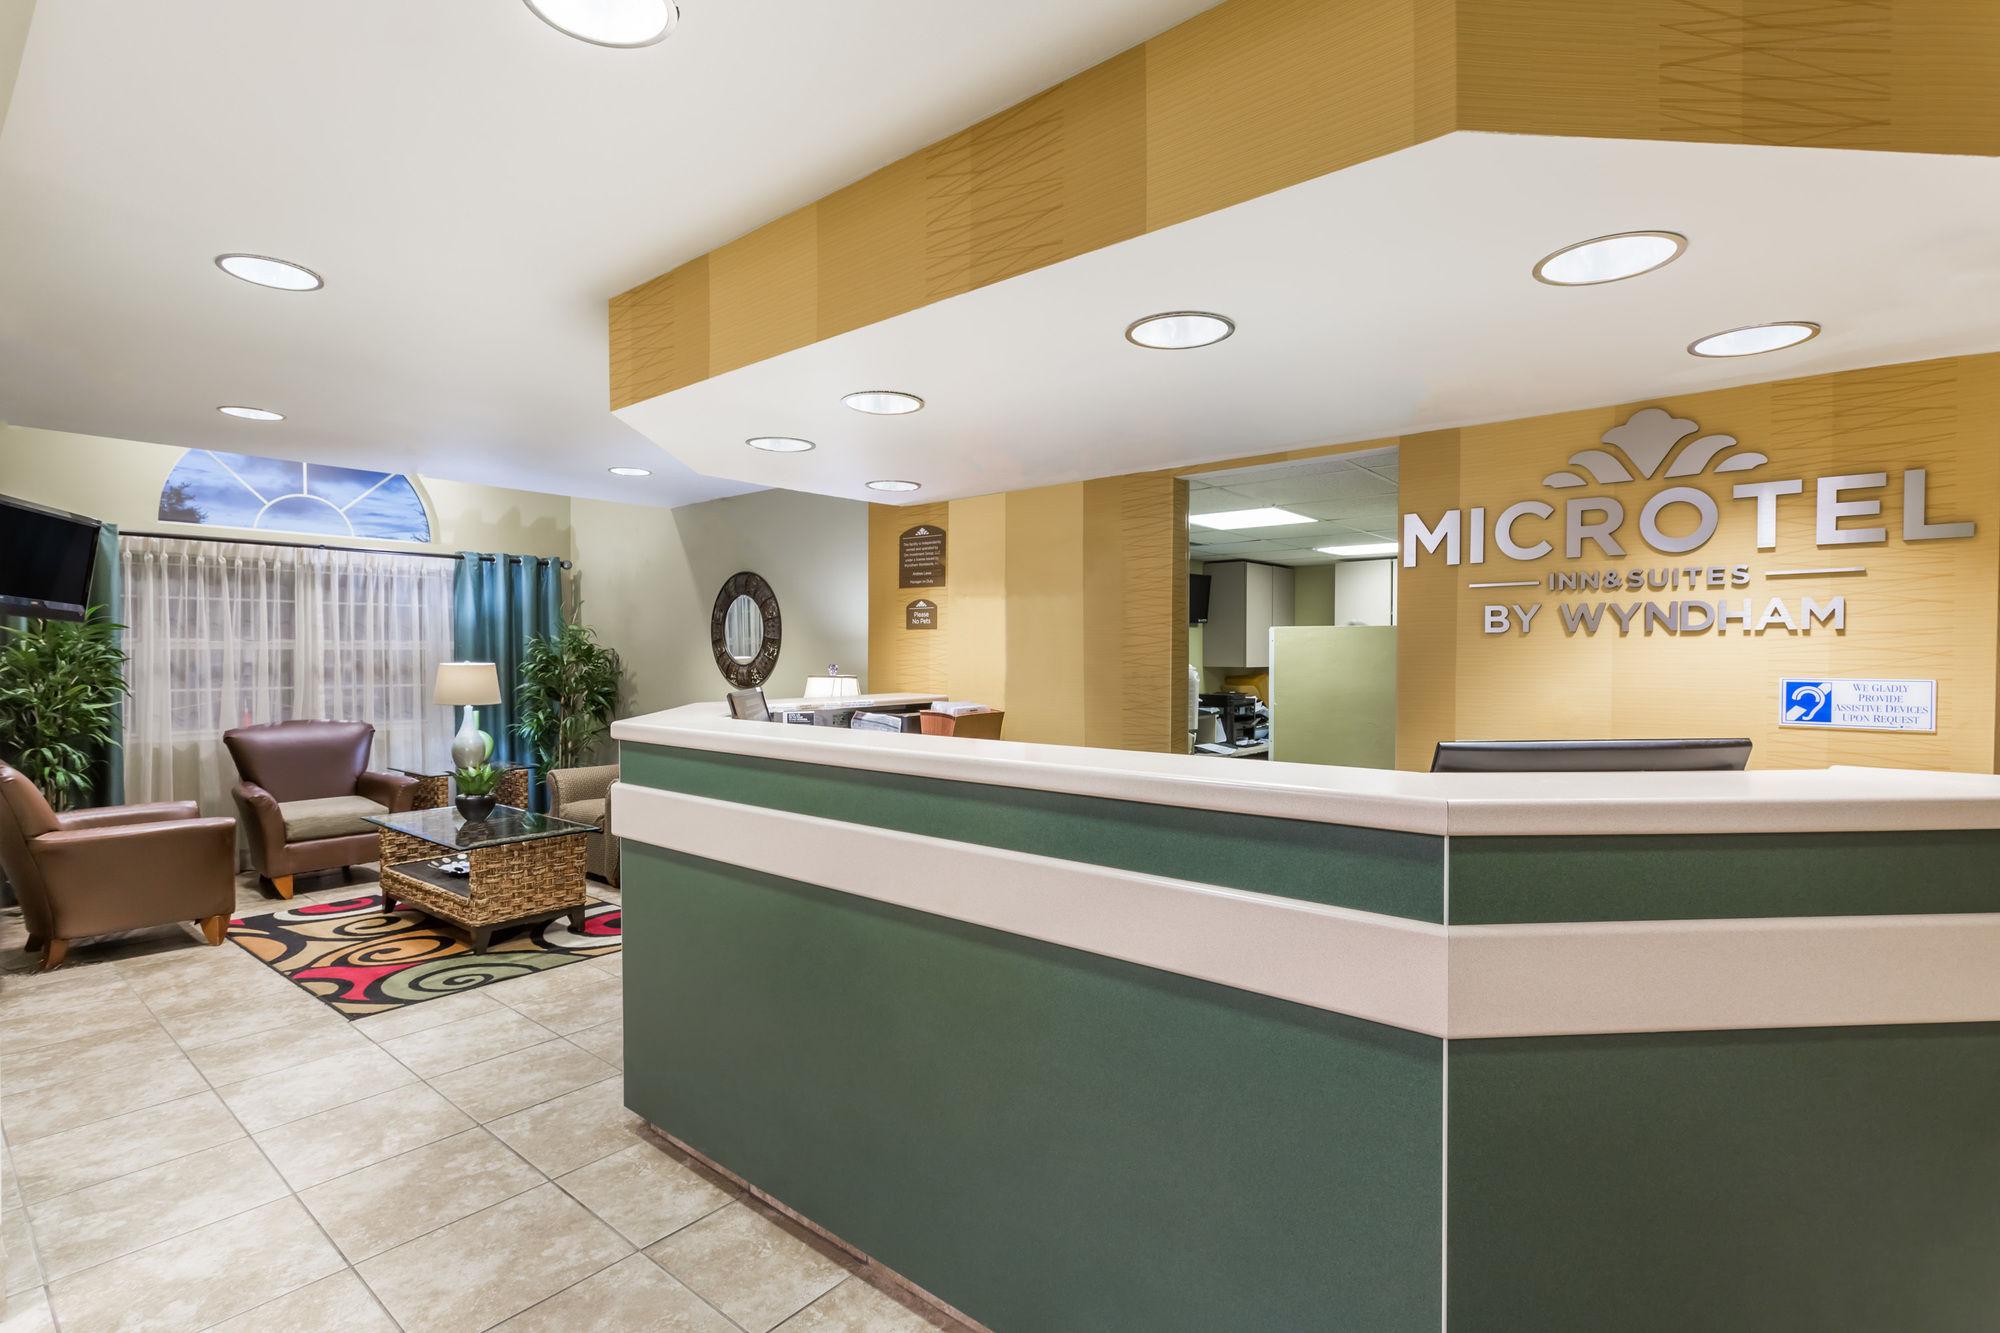 Microtel Inn & Suites by Wyndham Gulf Shores in Gulf Shores, AL